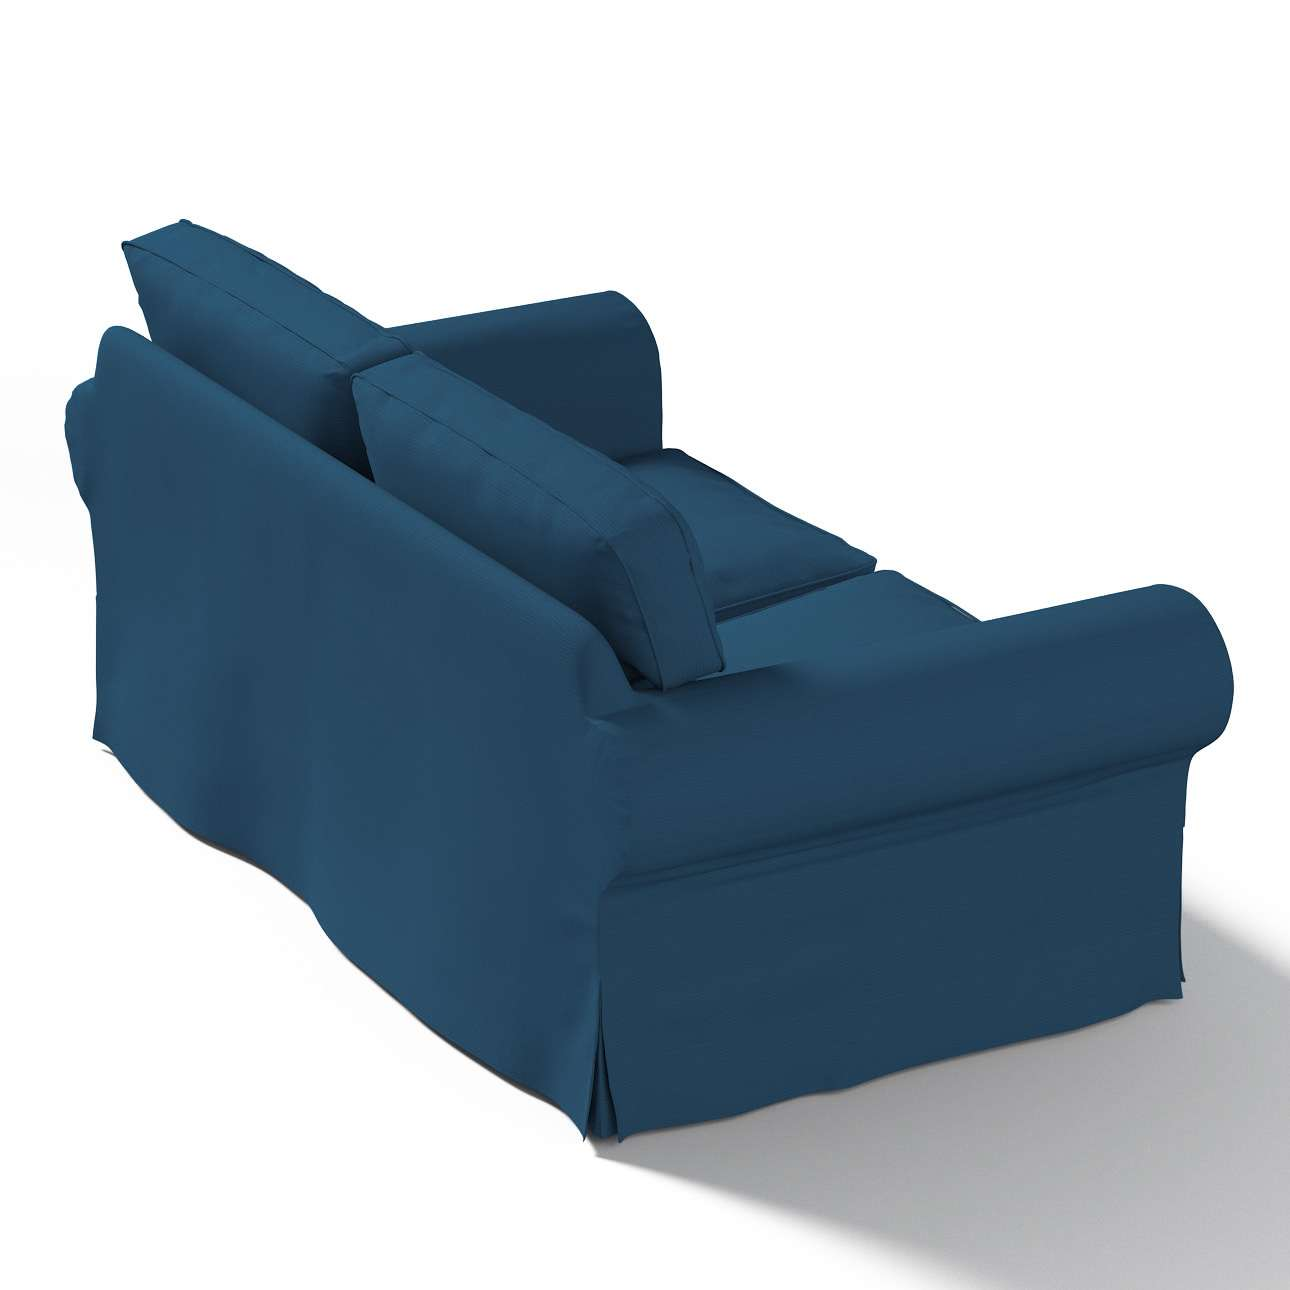 Ektorp 2-Sitzer Schlafsofabezug  ALTES Modell Sofabezug Ektorp 2-Sitzer Schlafsofa altes Modell von der Kollektion Cotton Panama, Stoff: 702-30